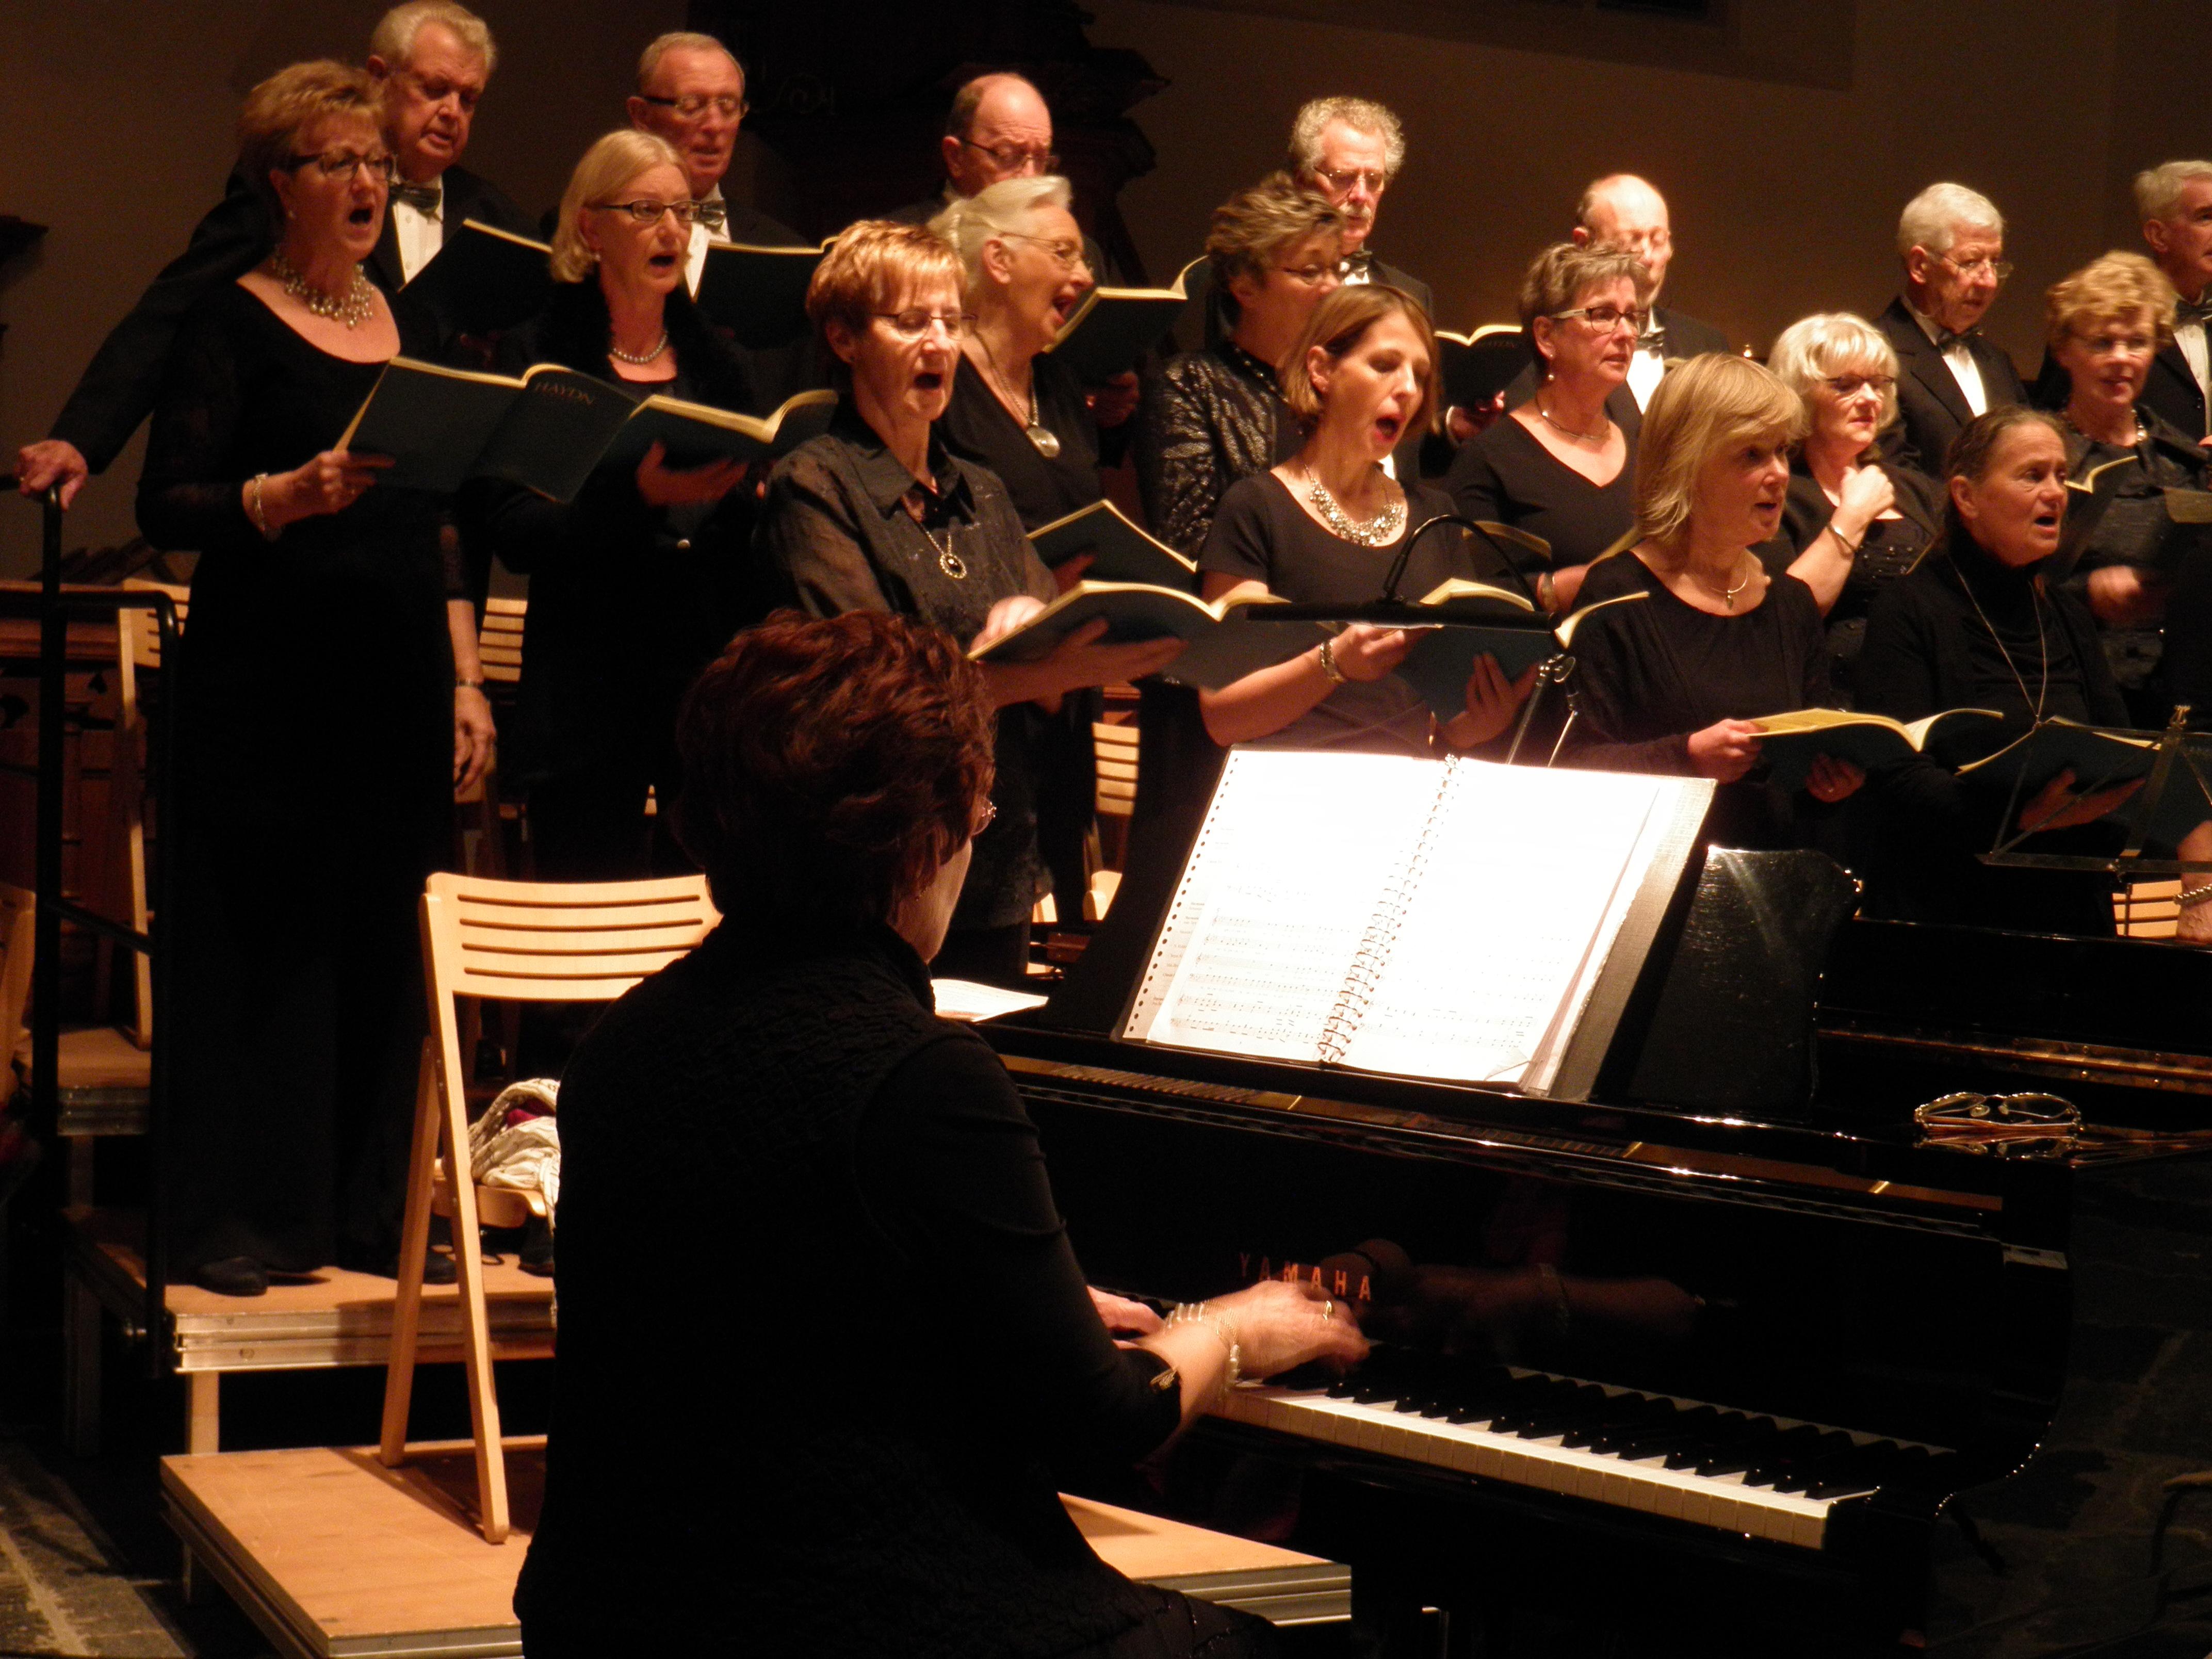 De Harmonie zingt. (Foto: Zangvereniging Harmonie)